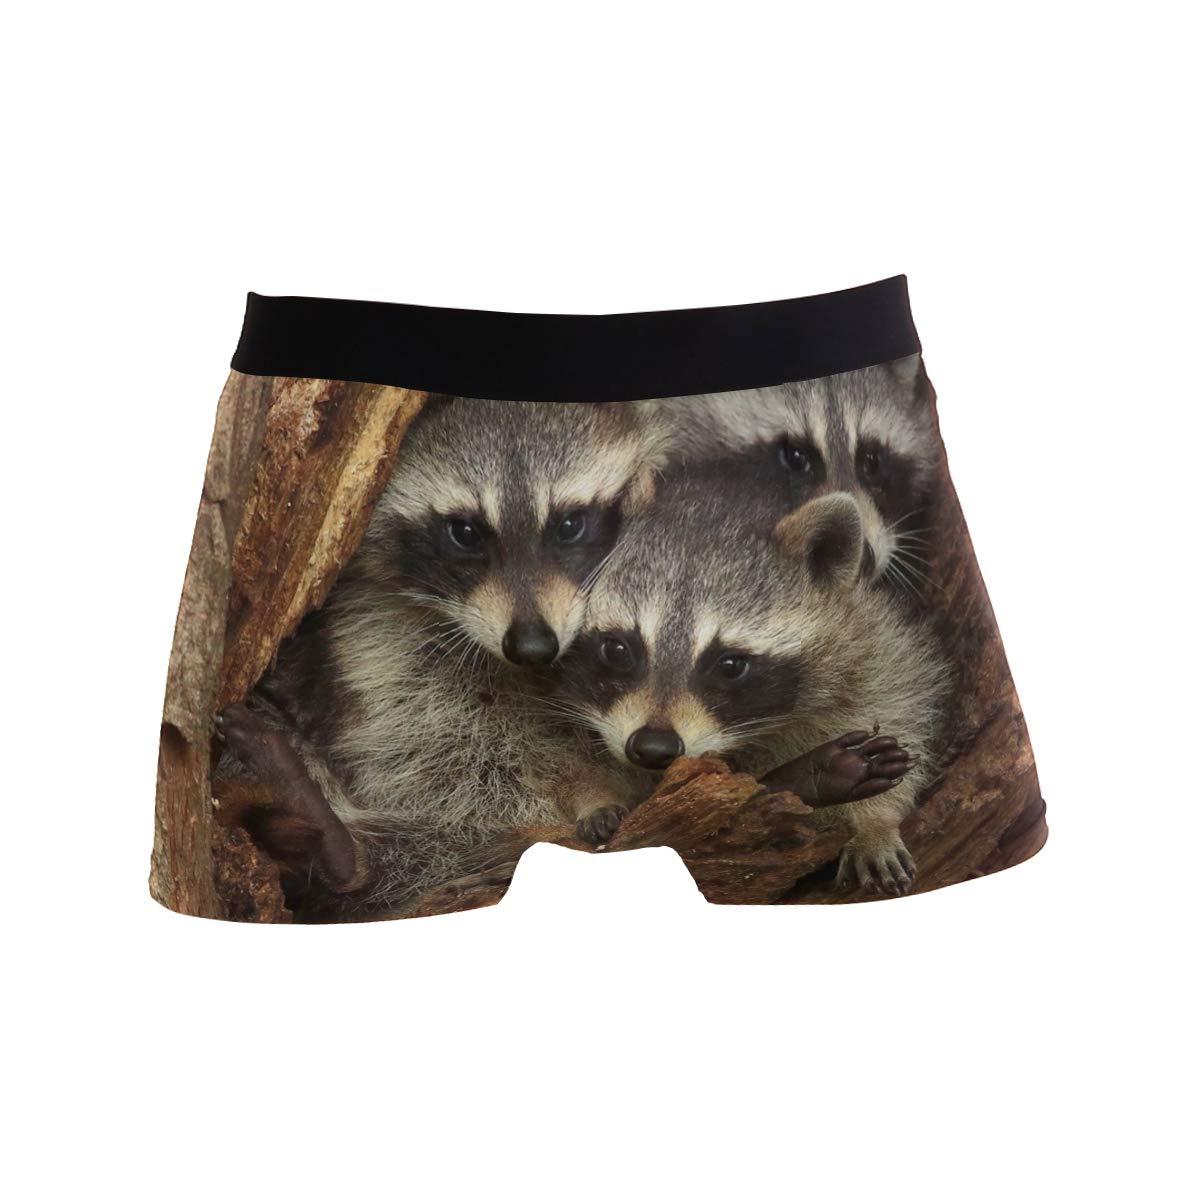 Jereee Three Cute Raccoons Mens Underwear Soft Polyester Boxer Brief for Men Adult Teen Children Kids S